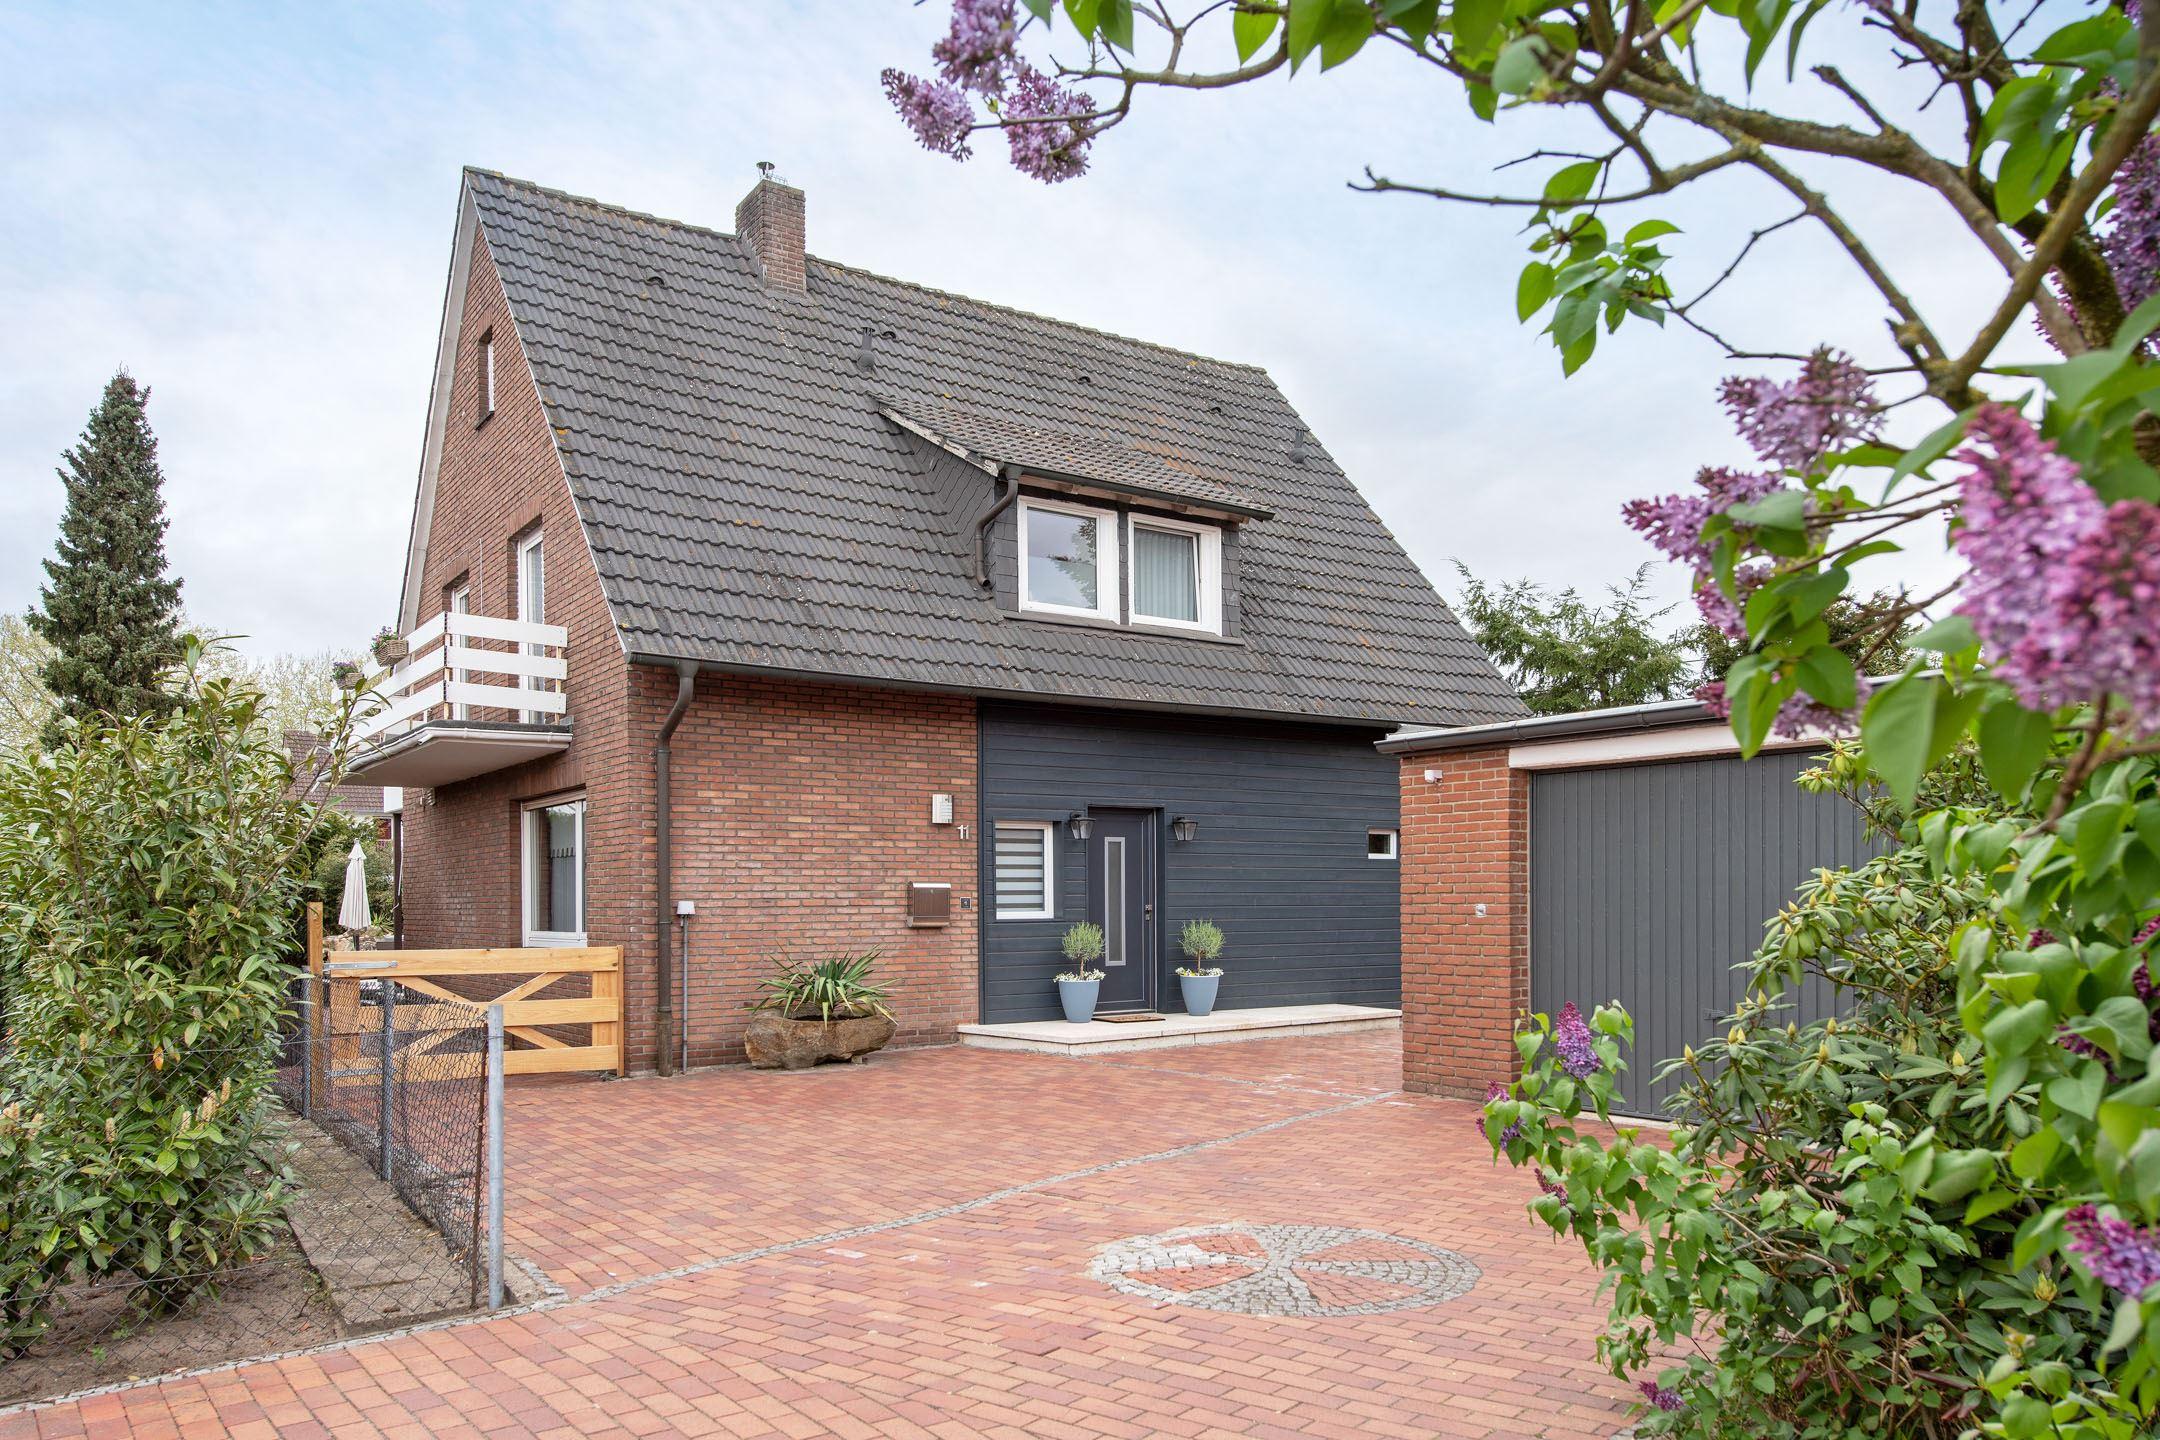 Badkamers Duitsland Nordhorn : Huis te koop lübecker strasse nordhorn duitsland funda